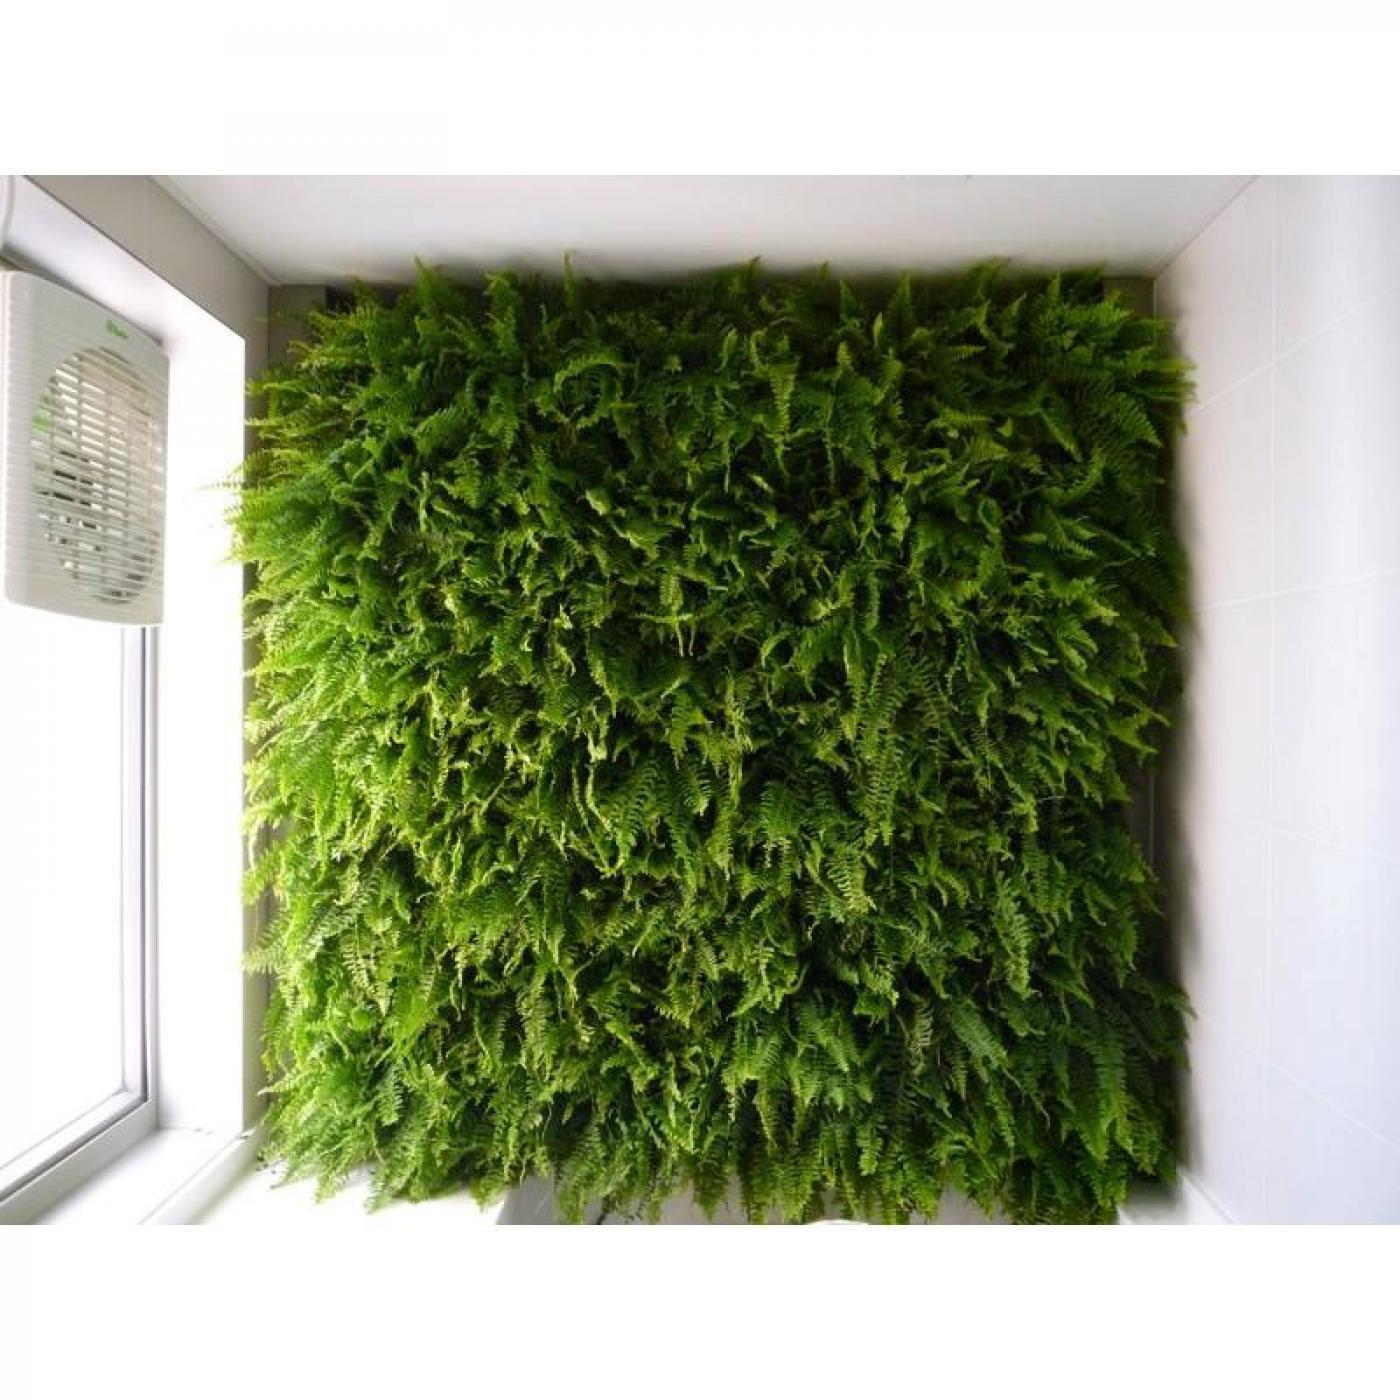 jardim vertical venda:Jardim vertical minigarden cor cinza por €51,45 em Planeta Huerto